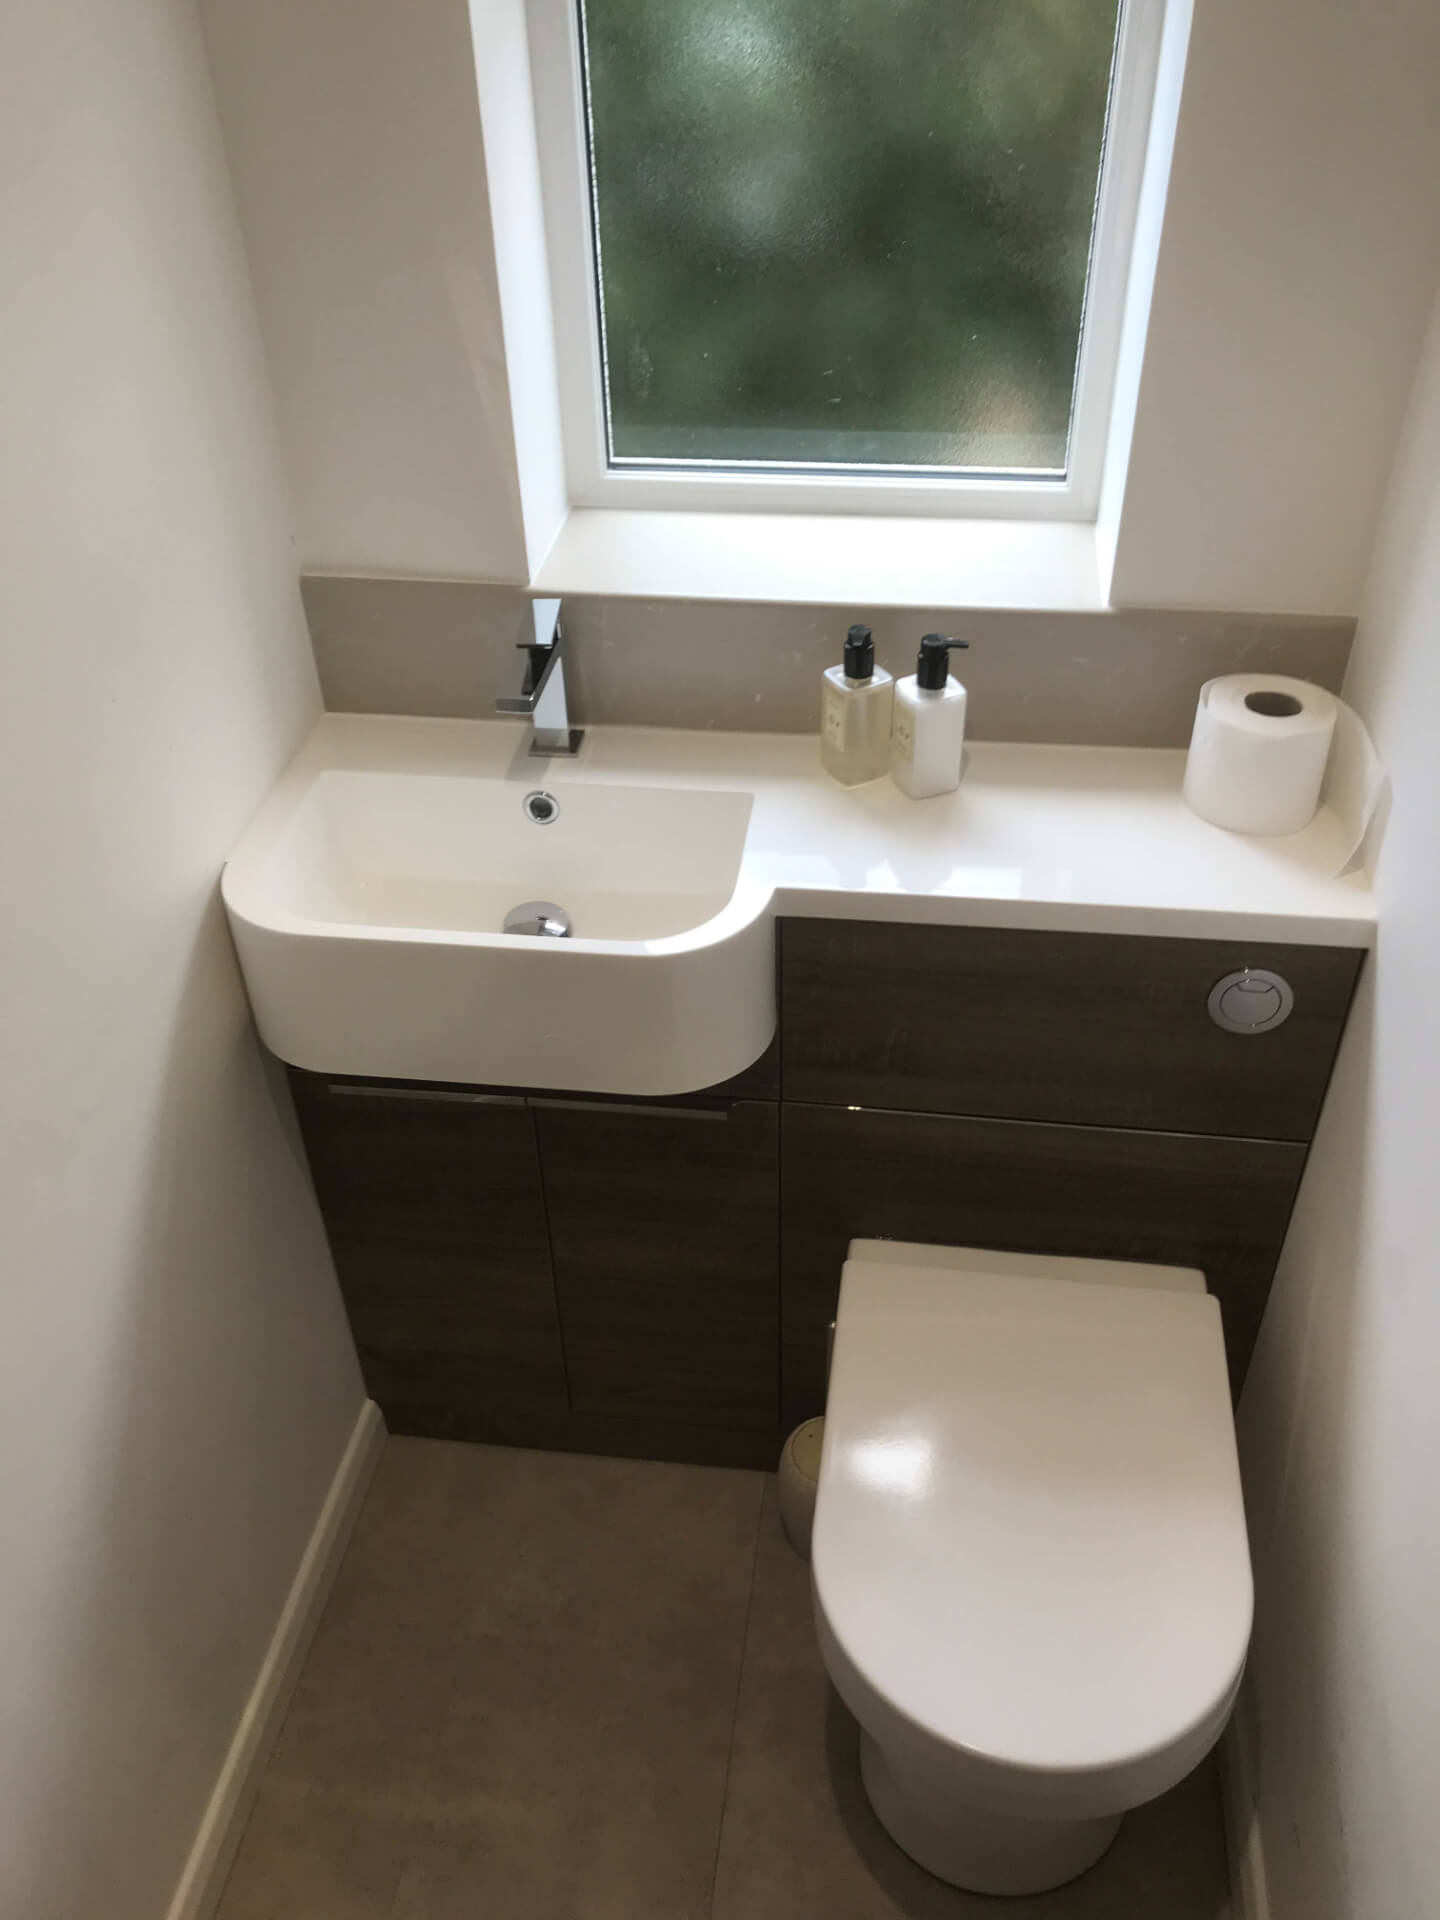 New Toilet Unit